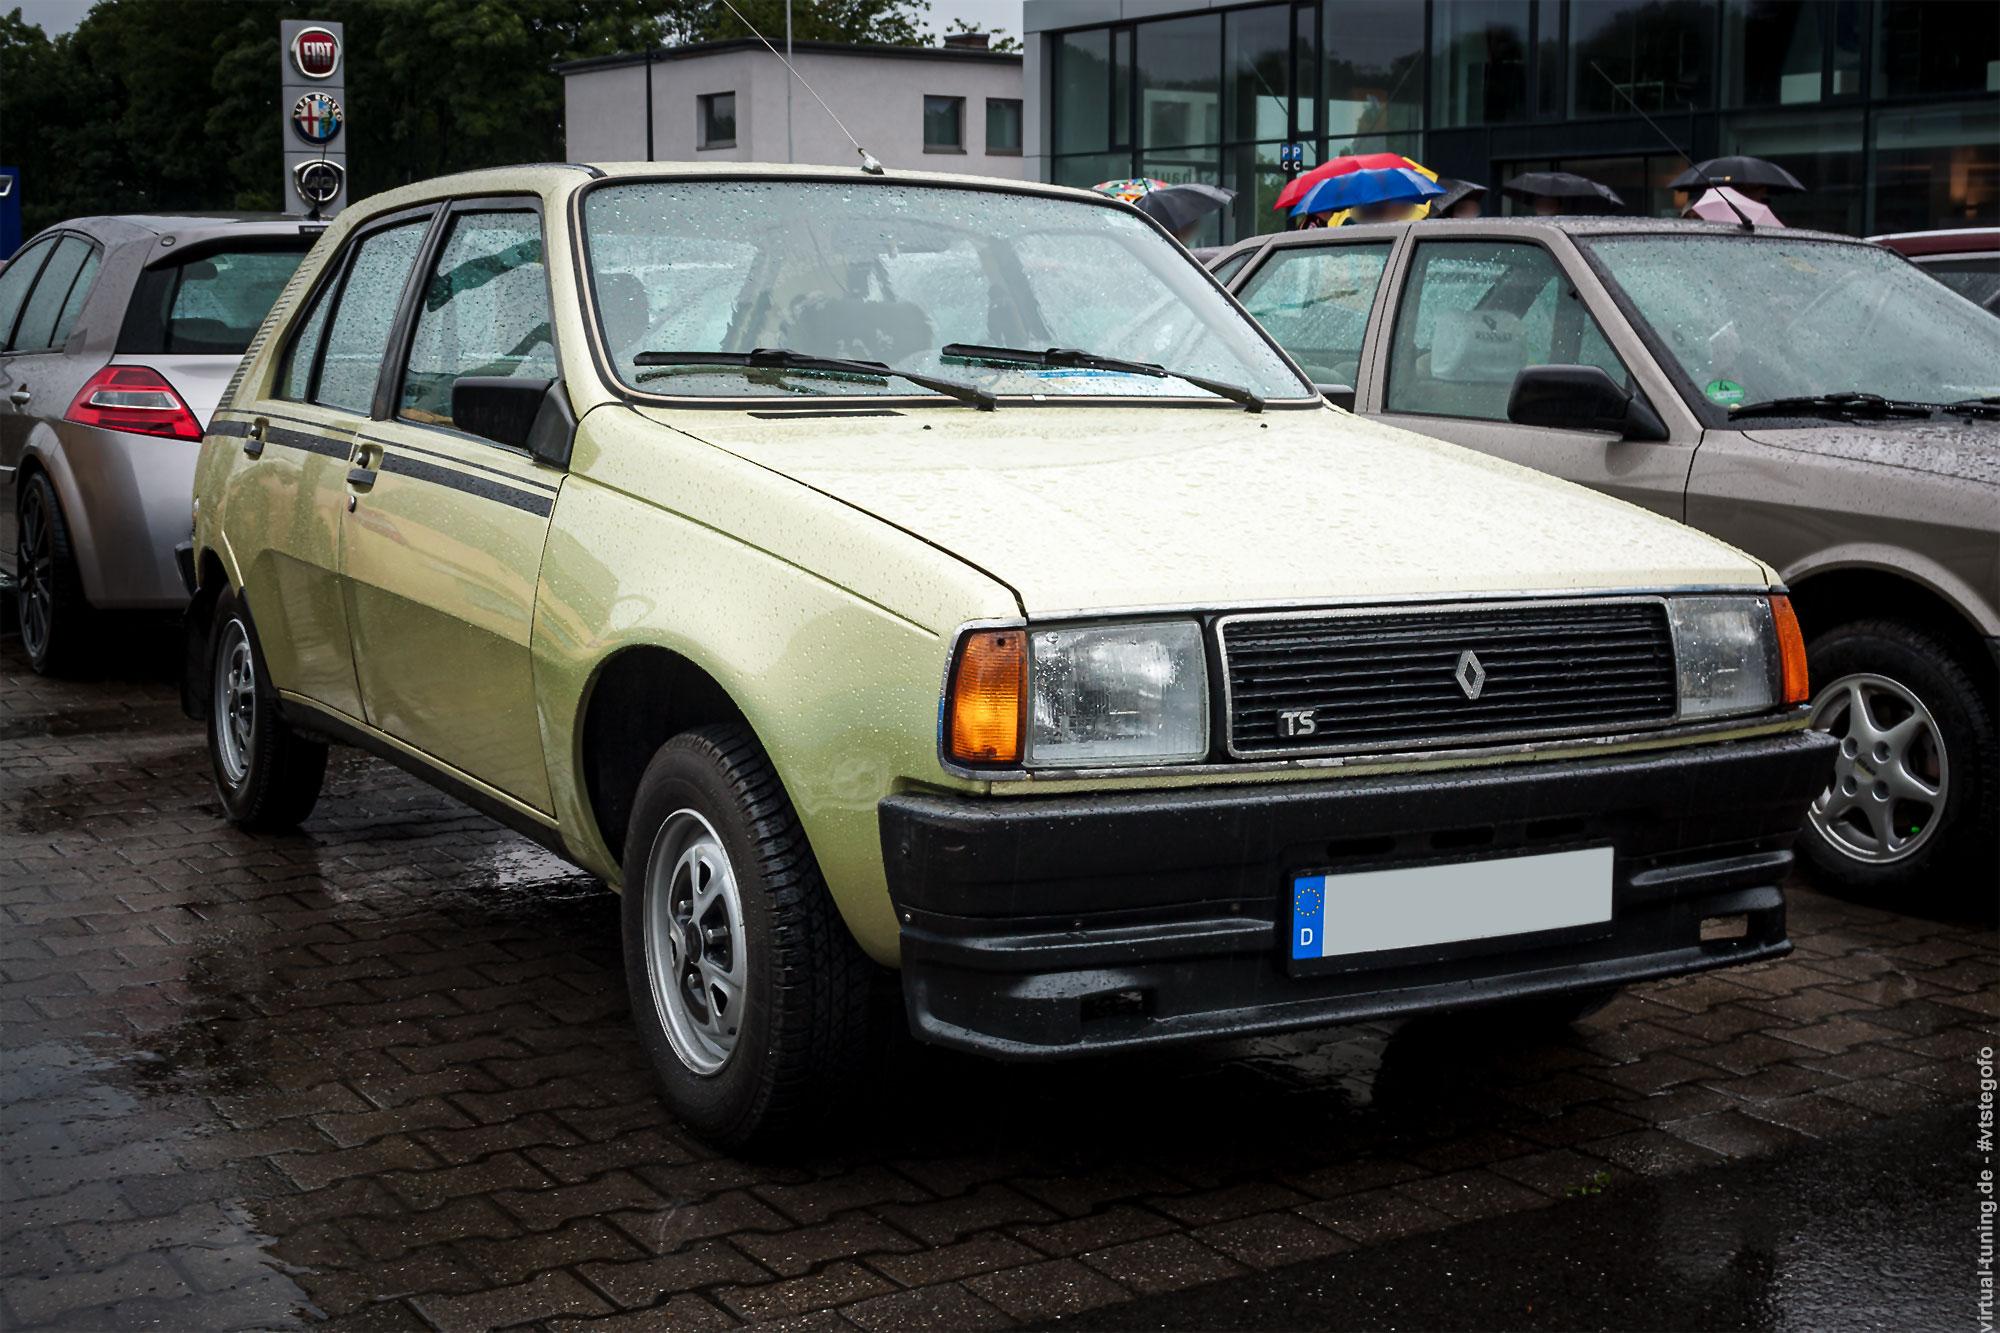 Renault 14 - Renault Treffen in Bochum (2012)